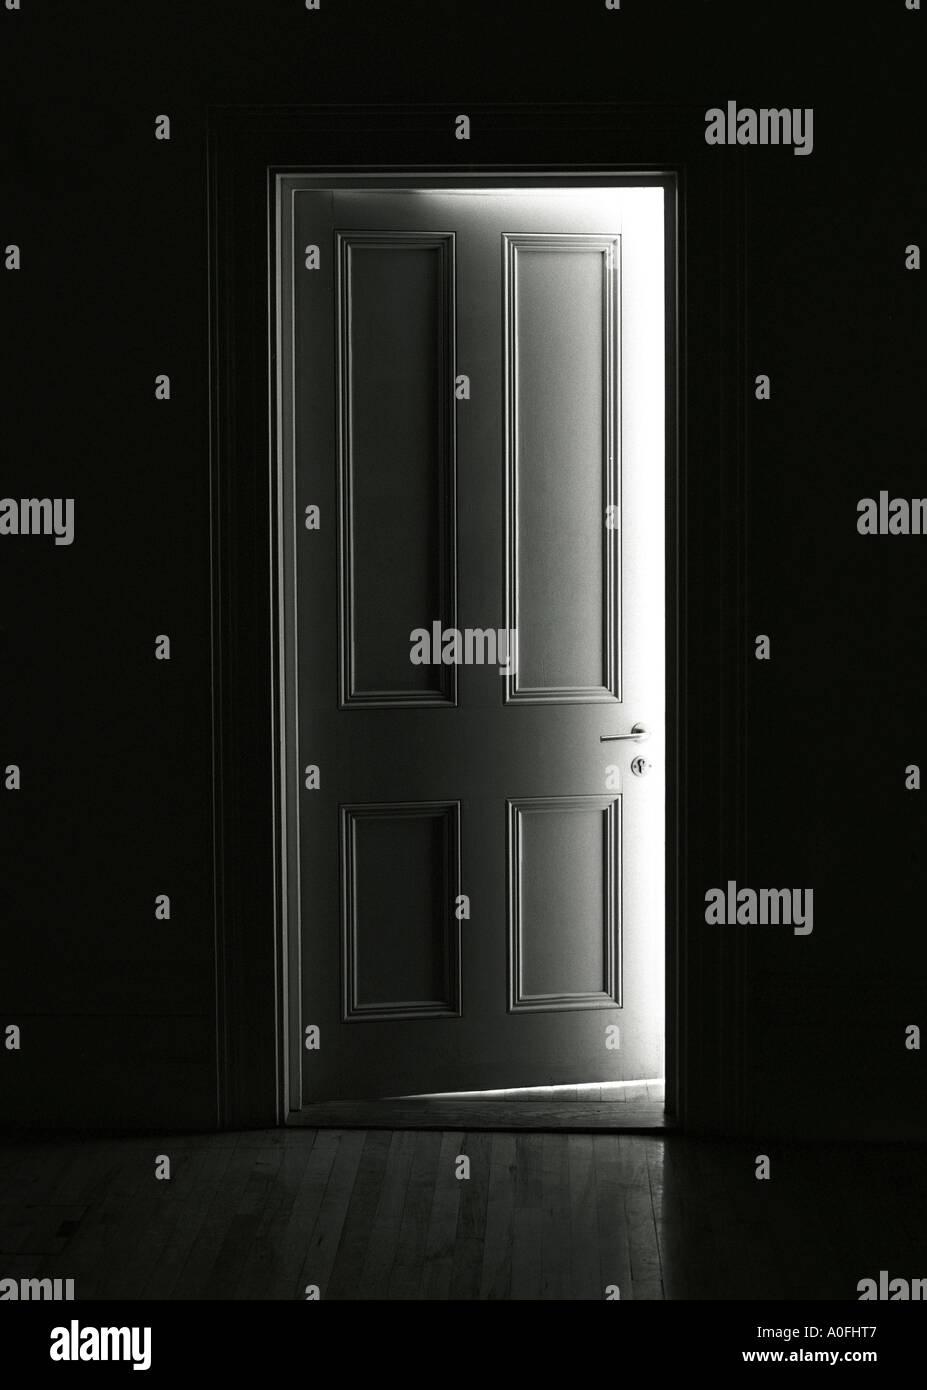 Door ajar London England & Door ajar London England Stock Photo: 5703750 - Alamy